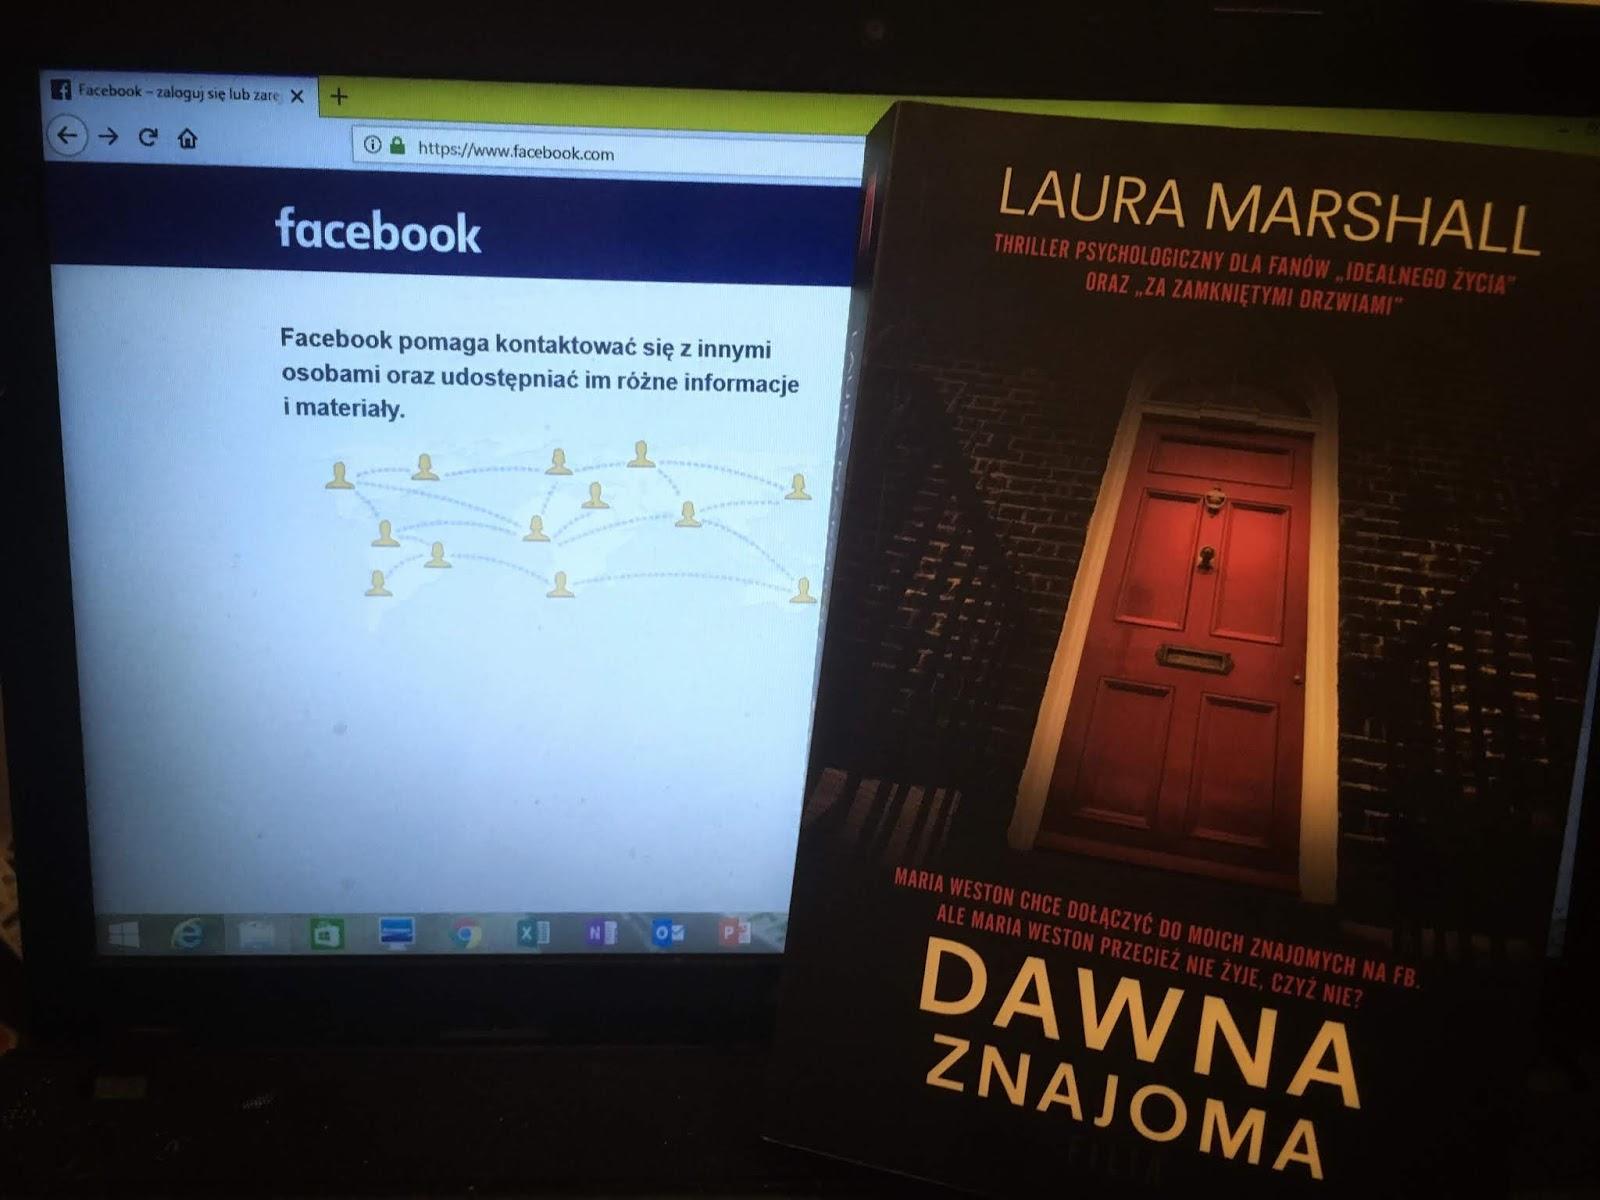 Laura Marshall - Dawna znajoma